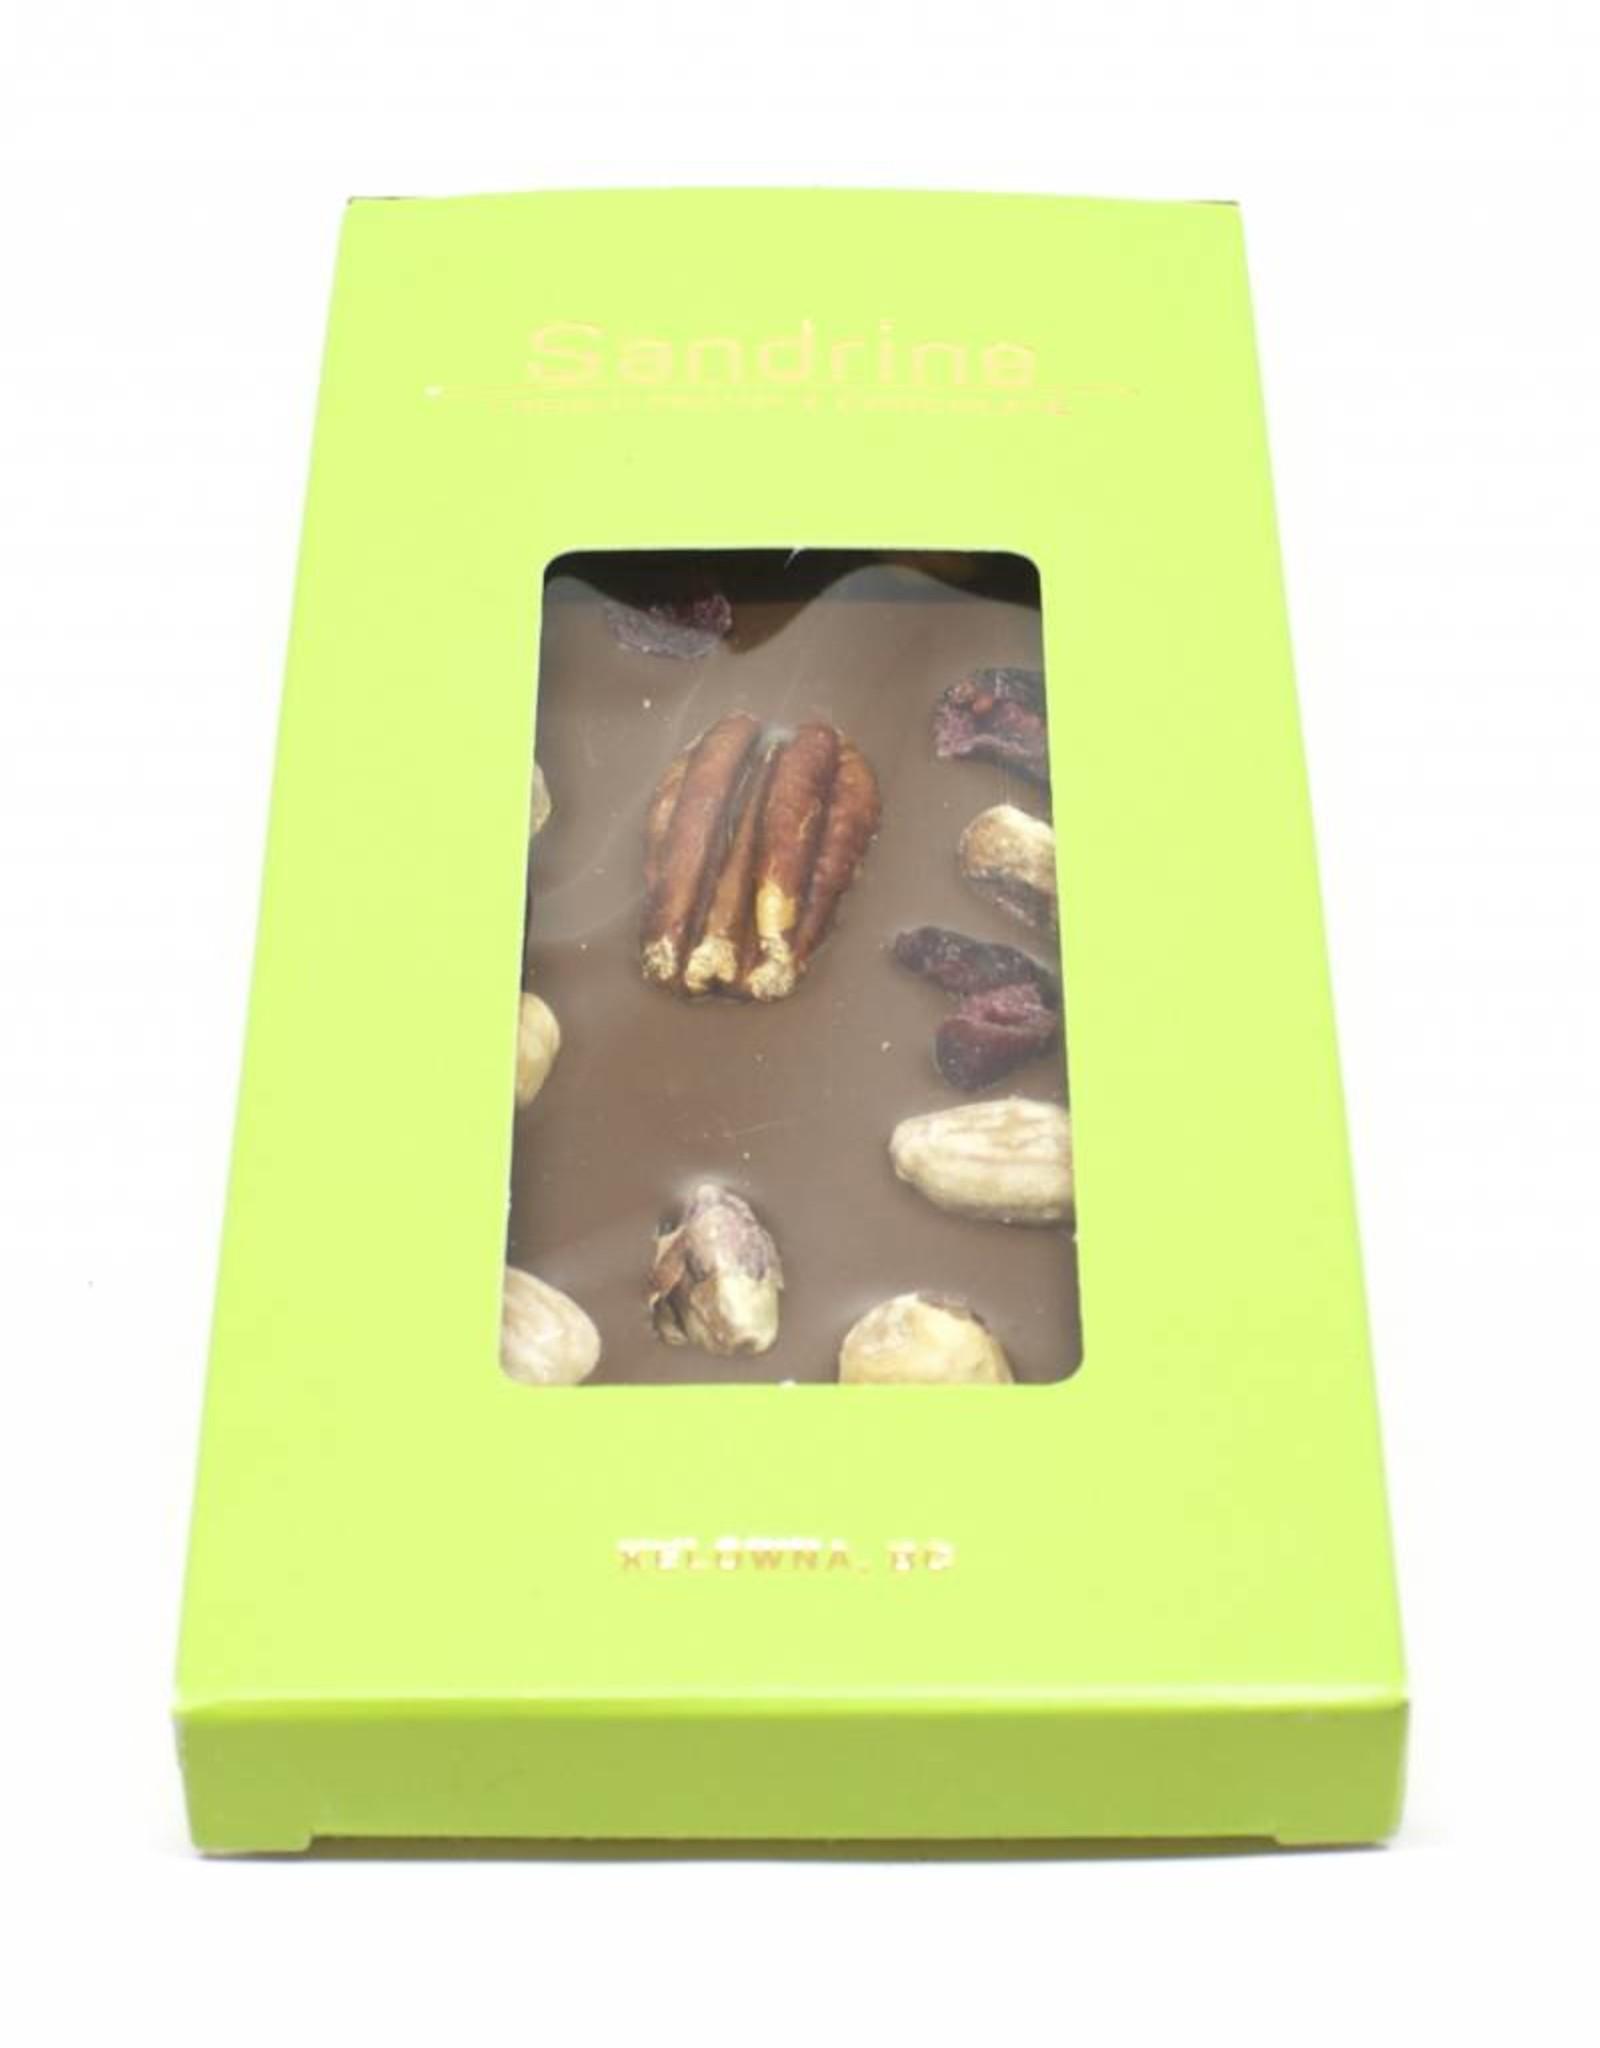 Sandrine Sandrine's Milk Chocolate with Nuts and Dried Fruits Bar